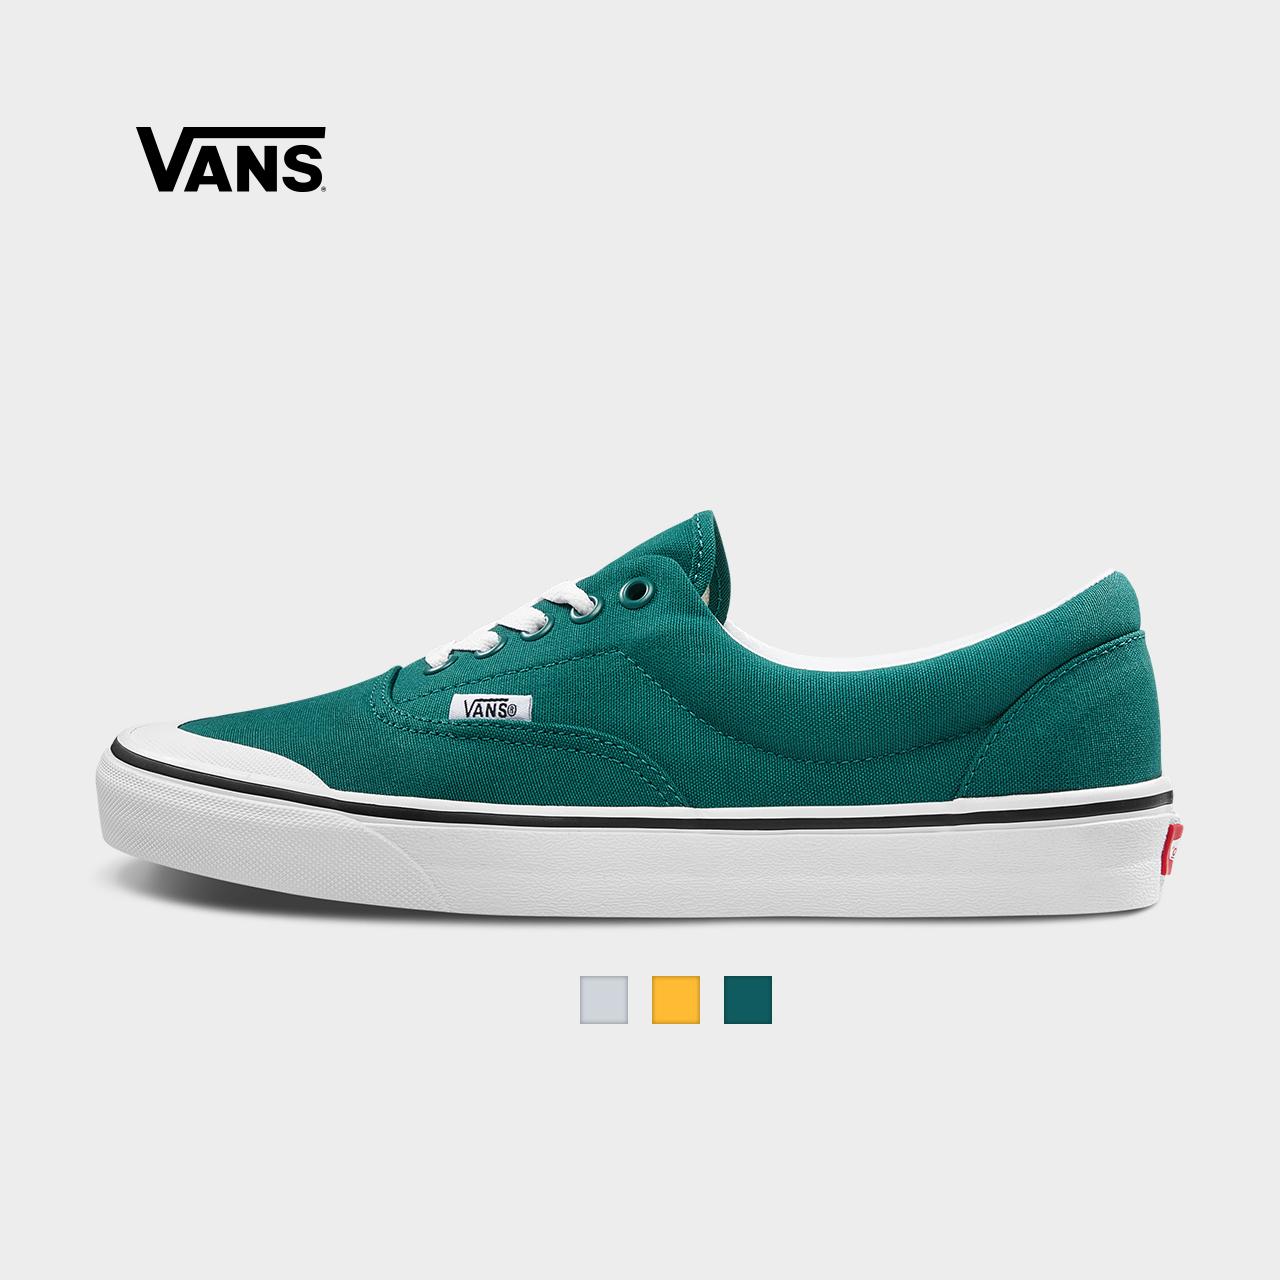 Vans范斯 经典系列 ERA帆布鞋 Toe Cap低帮男女半包头官方正品